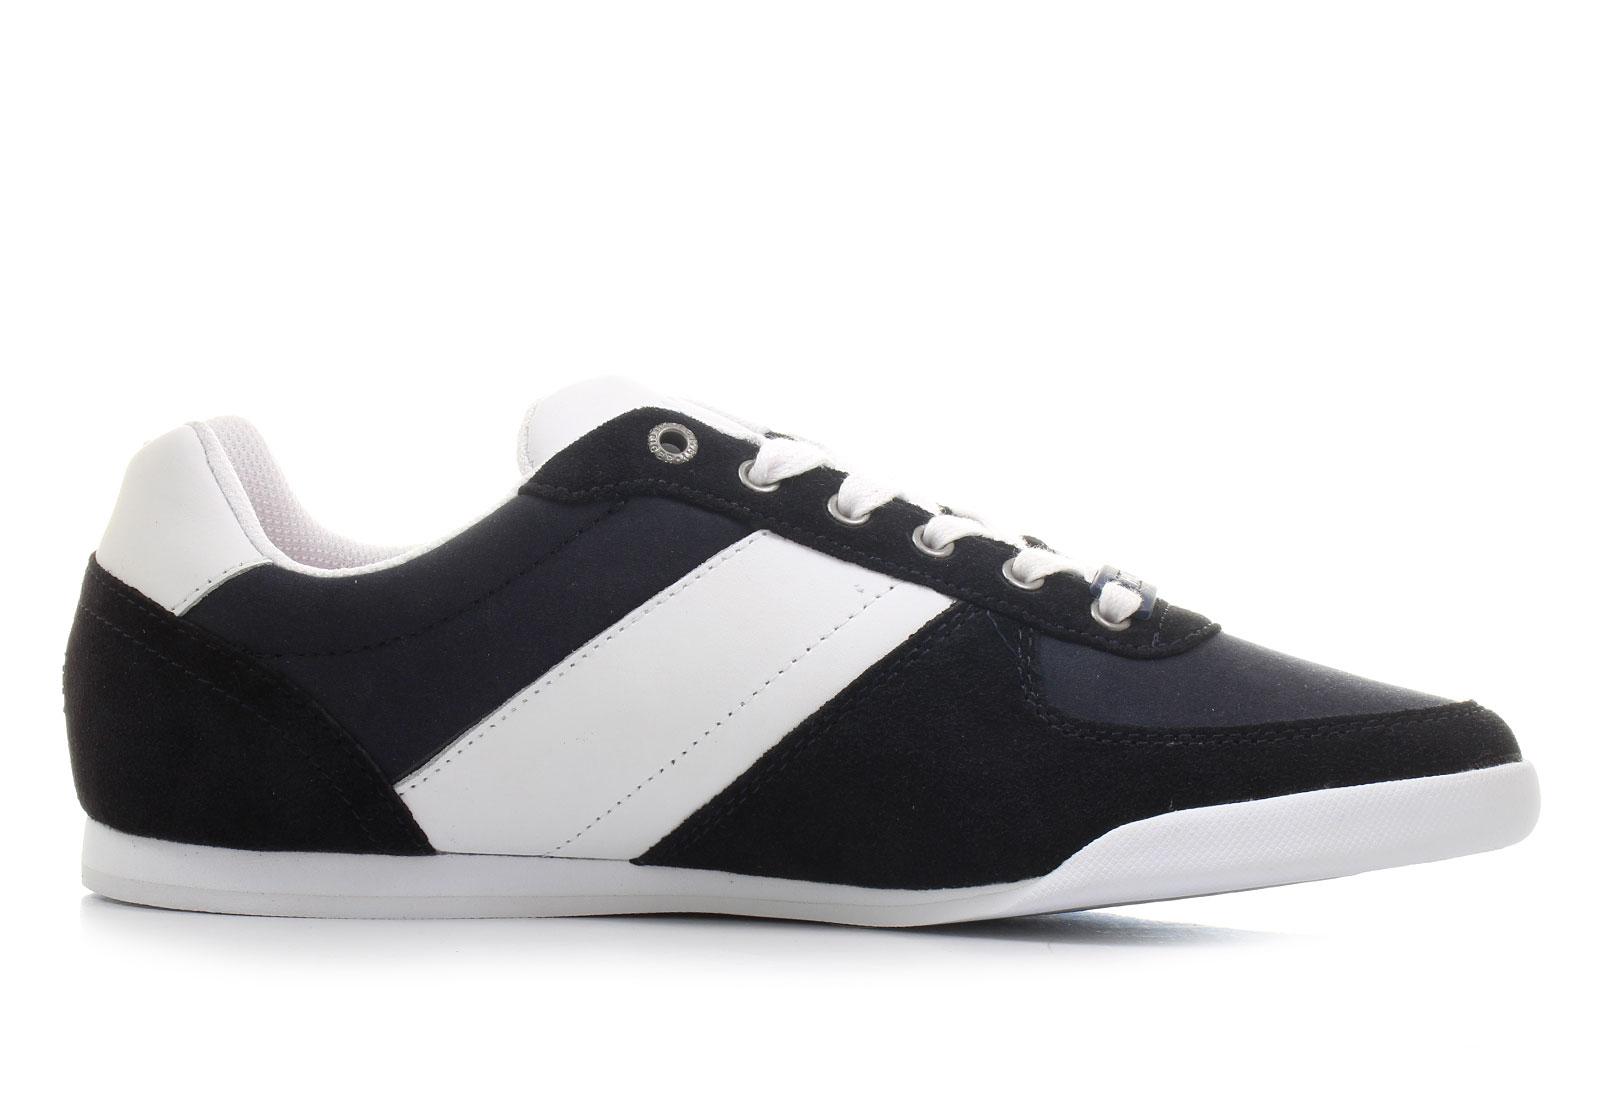 Tommy Hilfiger Cipő - Riley 2c - 16S-1103-403 - Office Shoes ... 4724503cf4